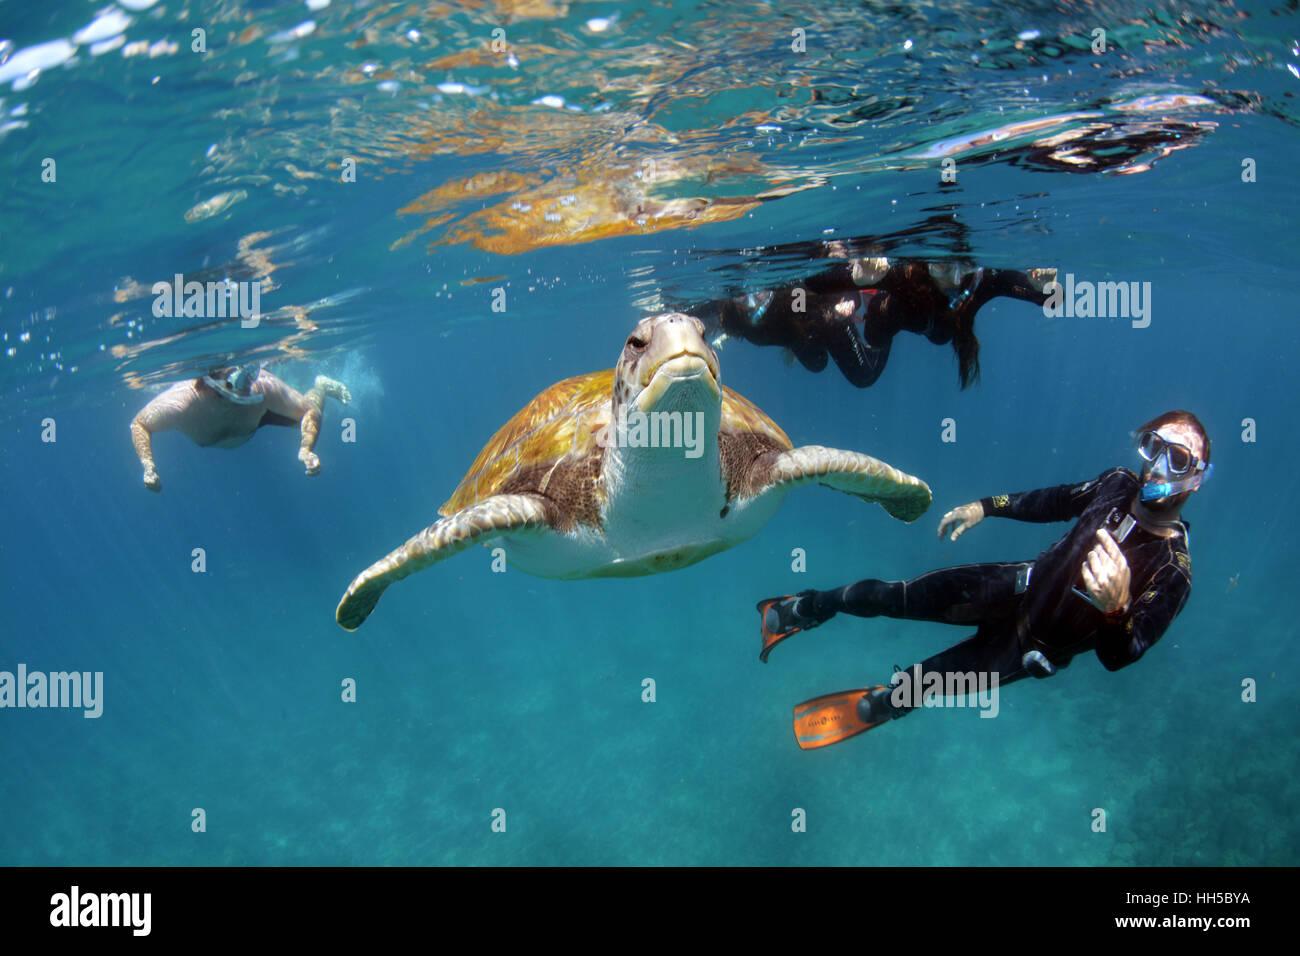 Nuoto con una tartaruga verde,Costa Adeje, Tenerife Foto Stock